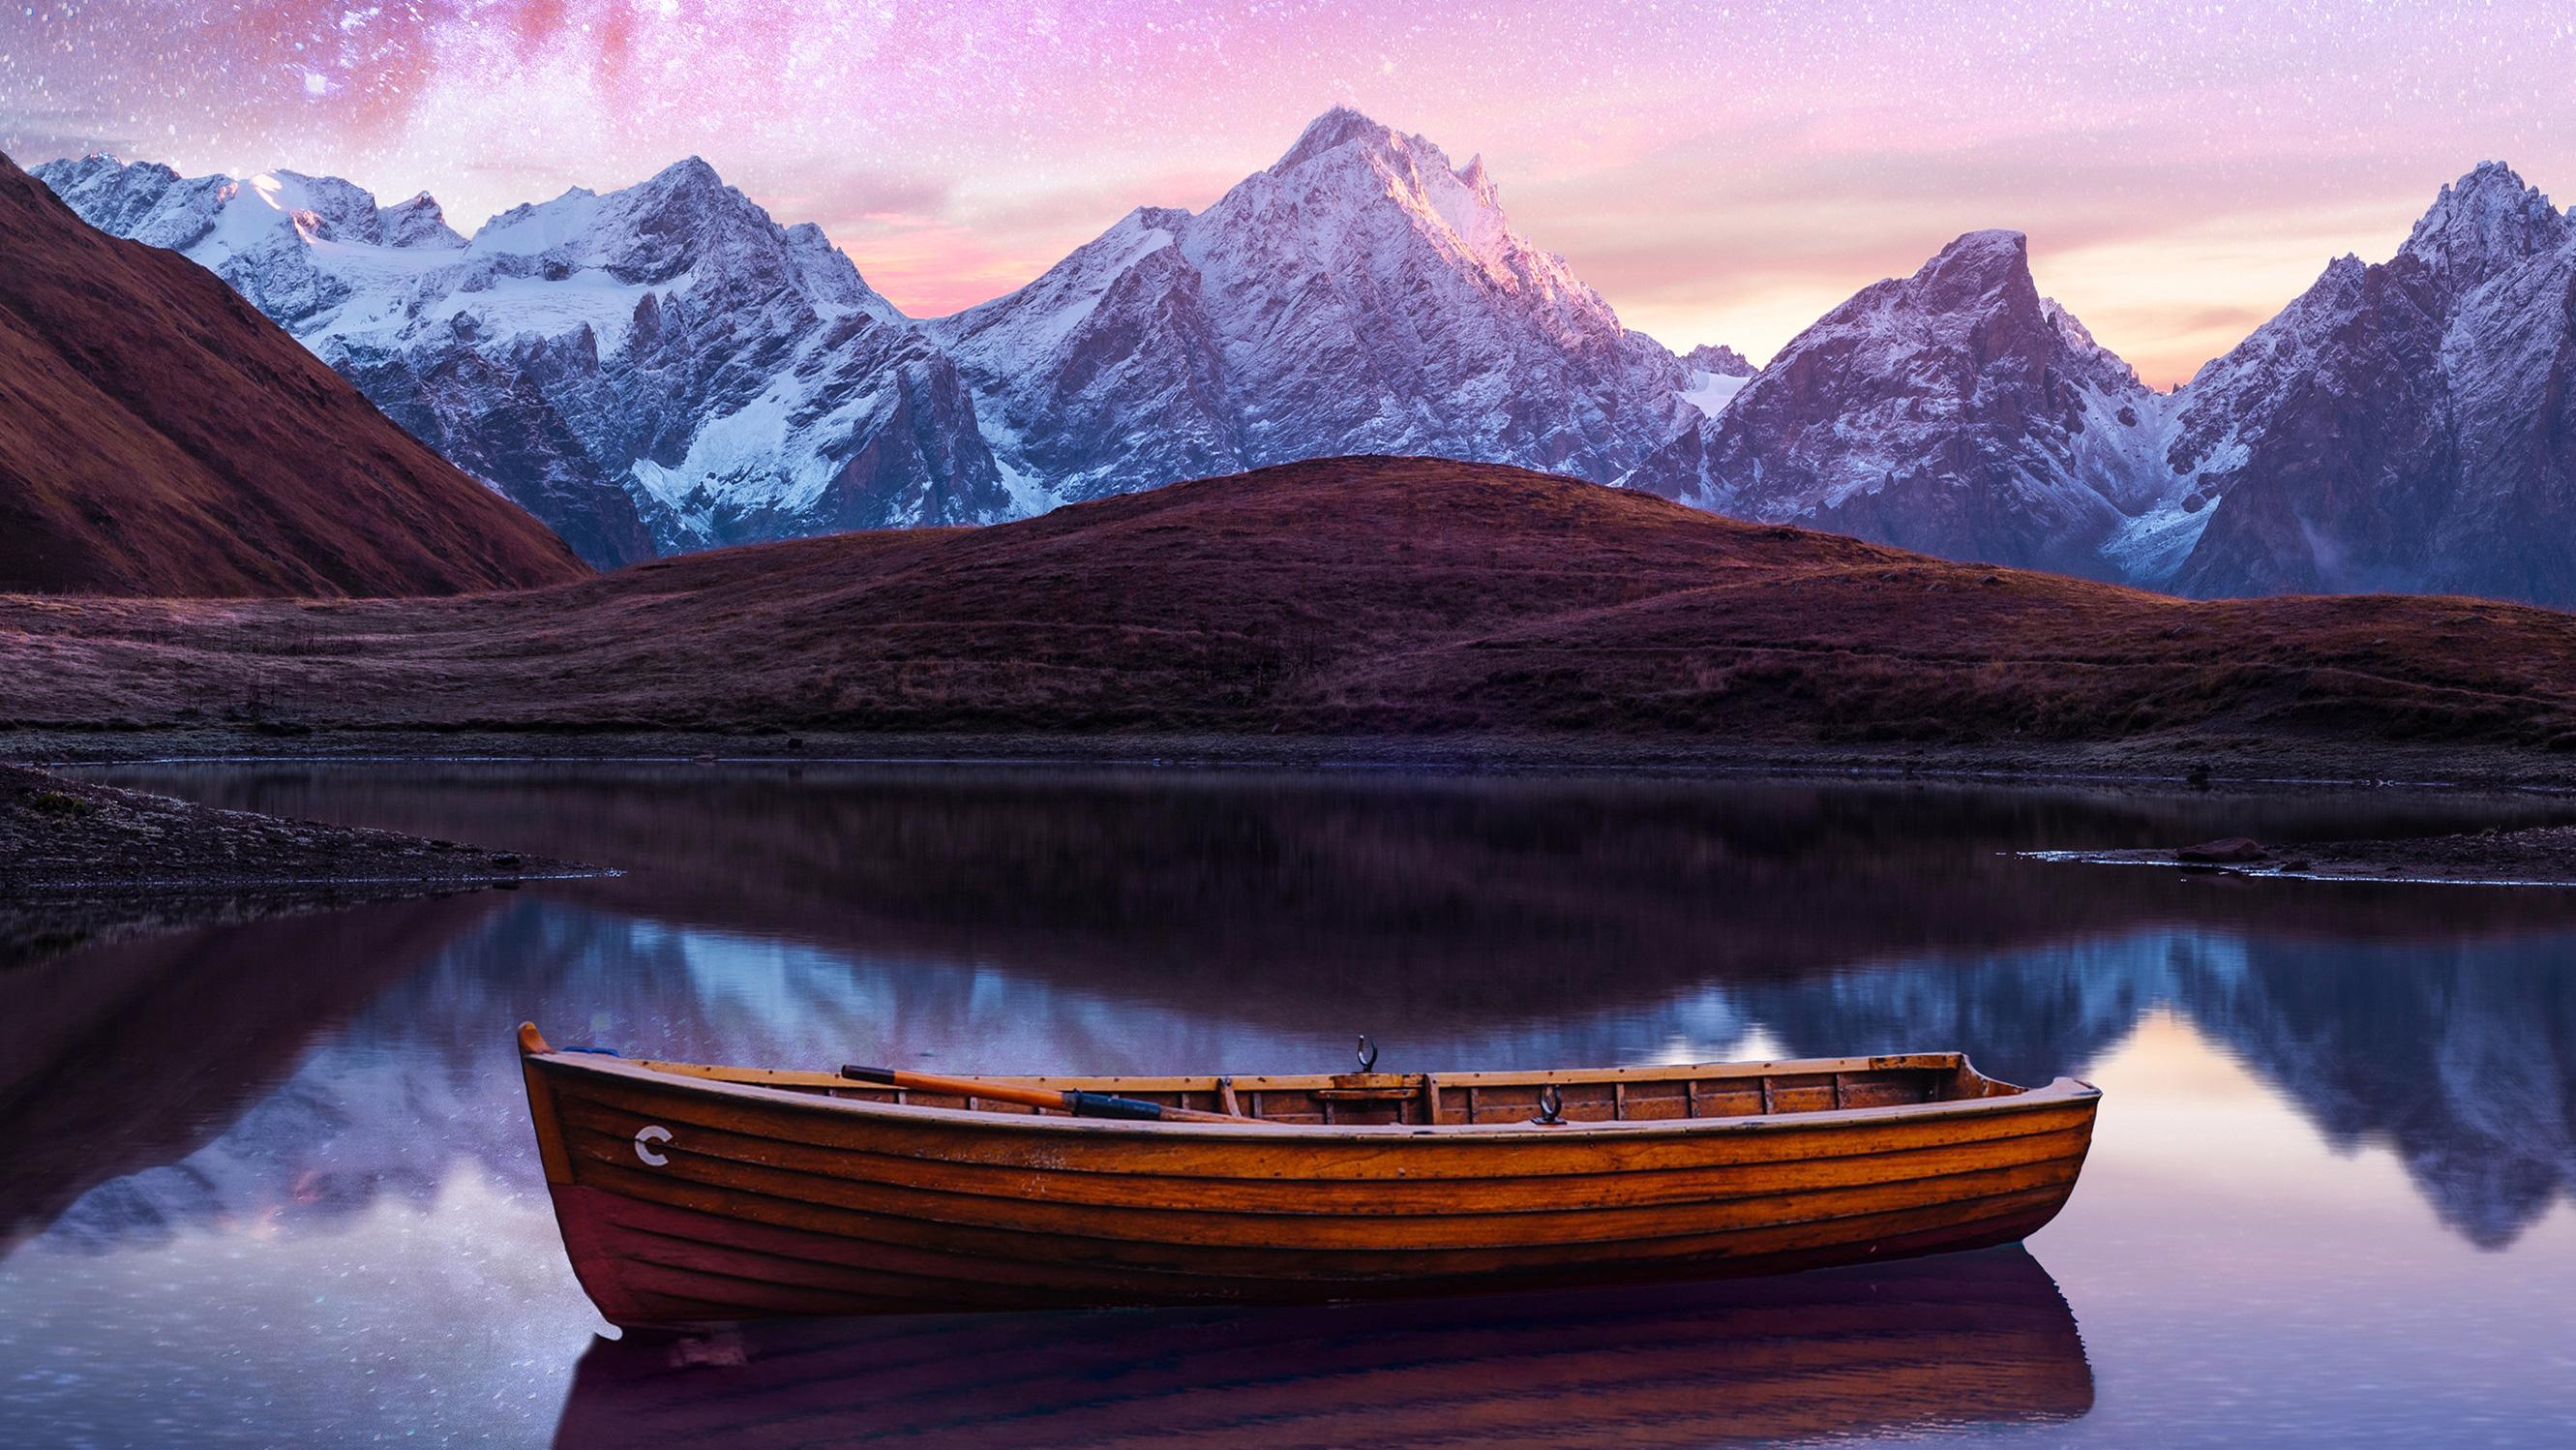 2560x1440 Boat Starry Night Sky 1440P Resolution HD 4k ...